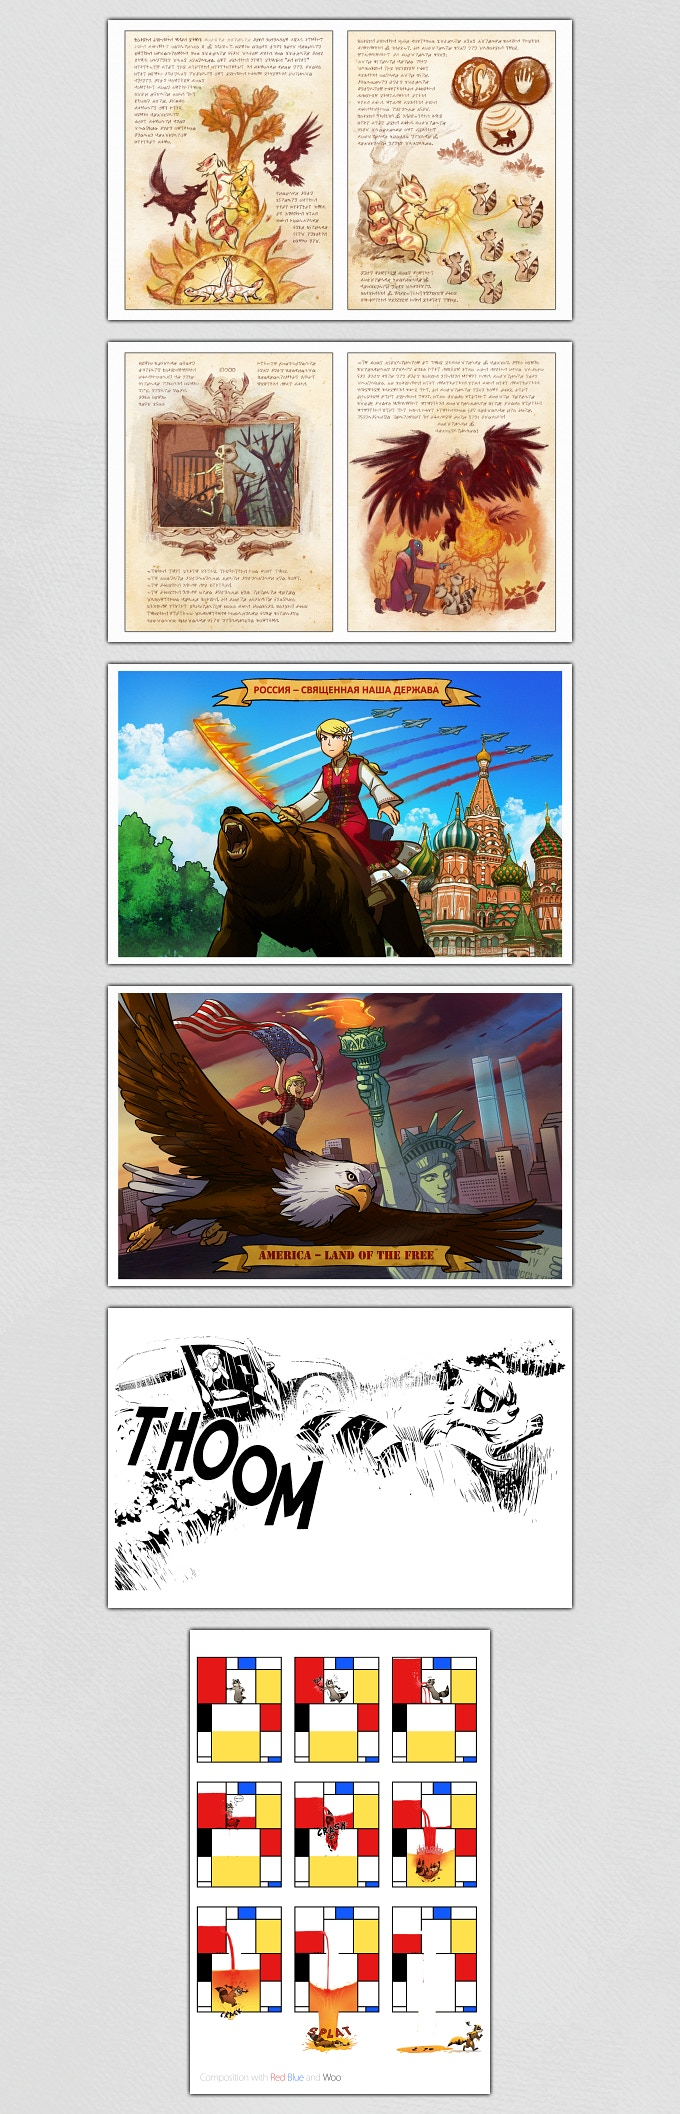 Gaia Webcomic sandra and woo: 10 years anthology + art bookoliver